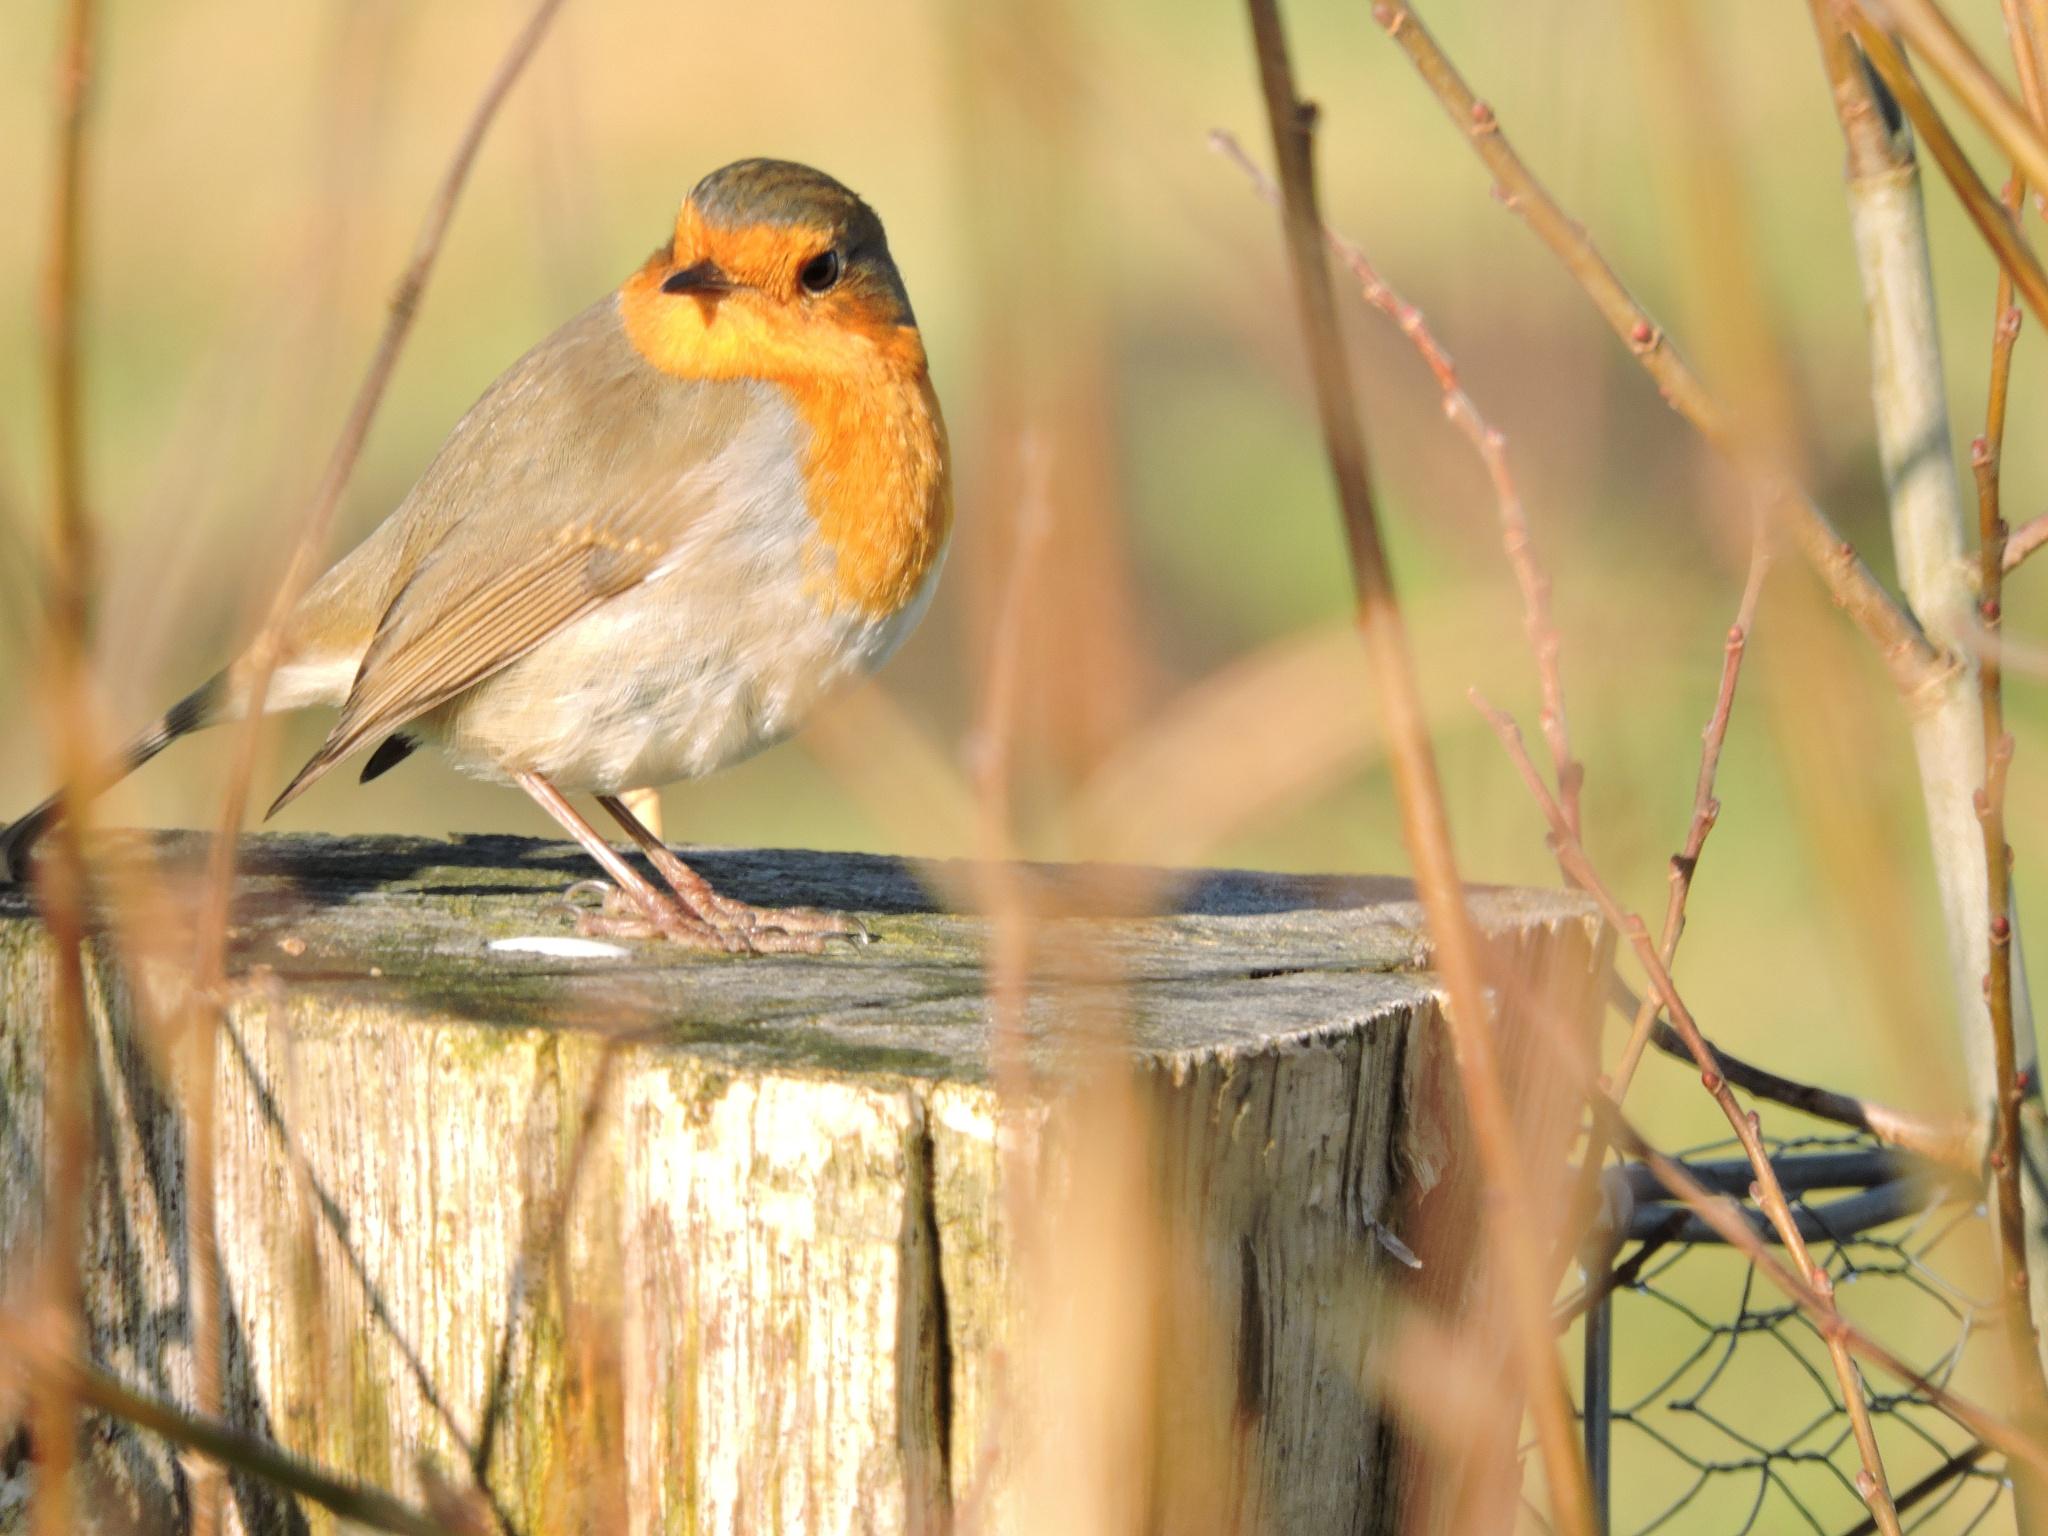 Robin by FranklinB